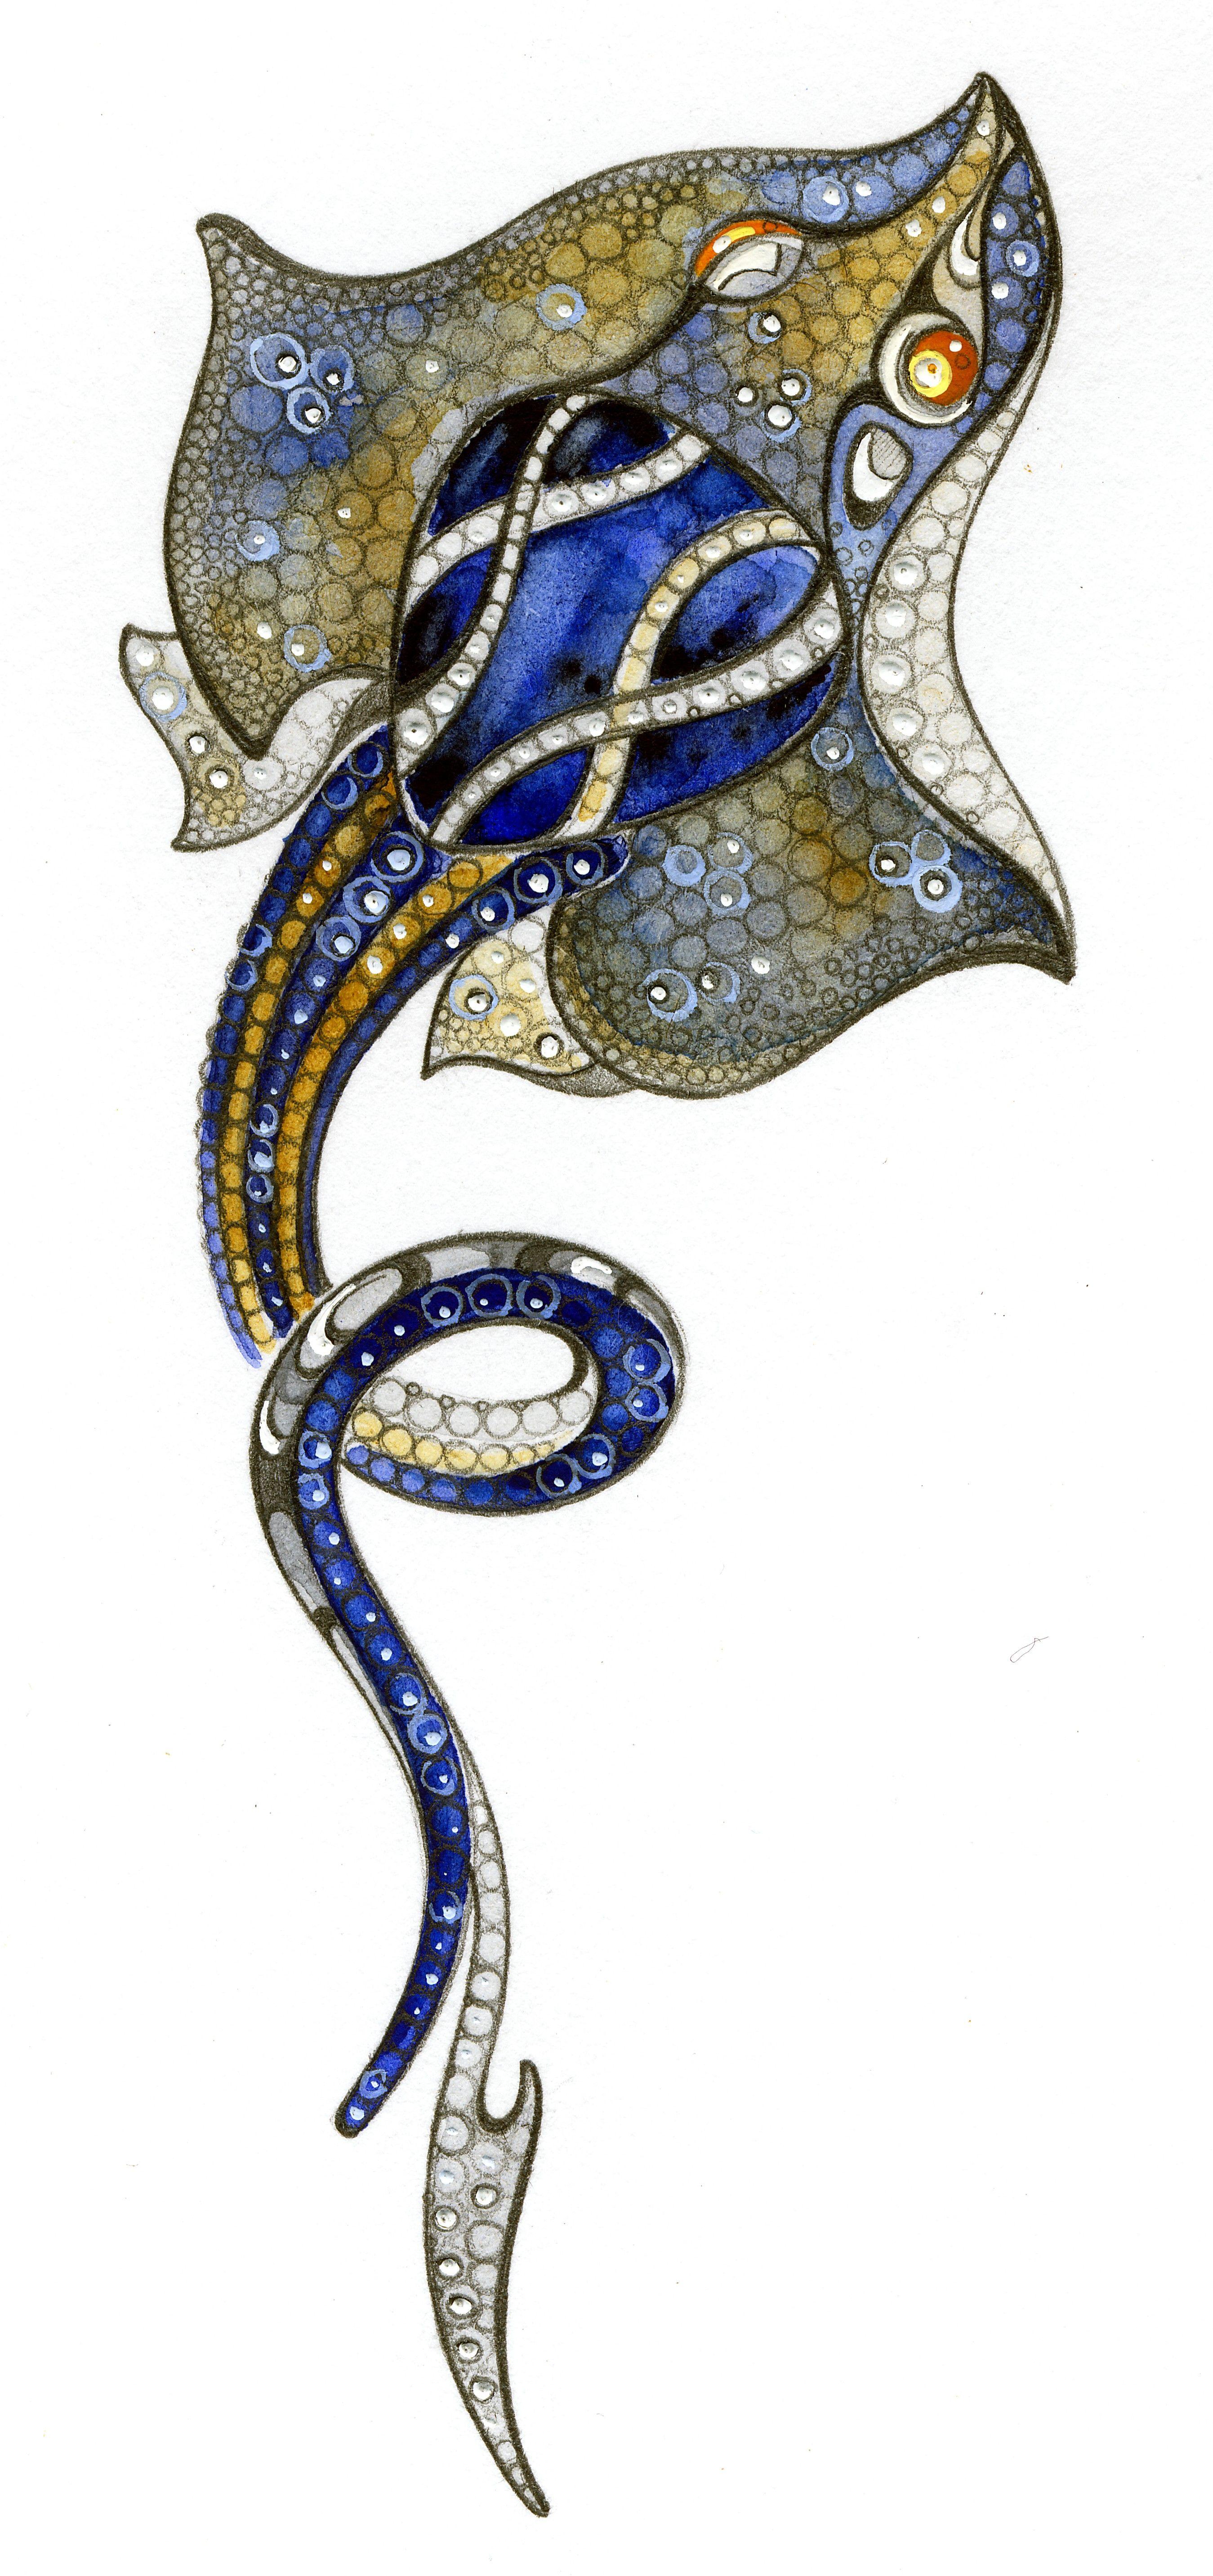 "Pendant from ""Ocean Secrets"" Collection by Master Exclusive Jewelry:  18K white gold, topaz  London blue 9,92 ct, diamonds, cognac diamonds, blue sapphires, orange sapphires."